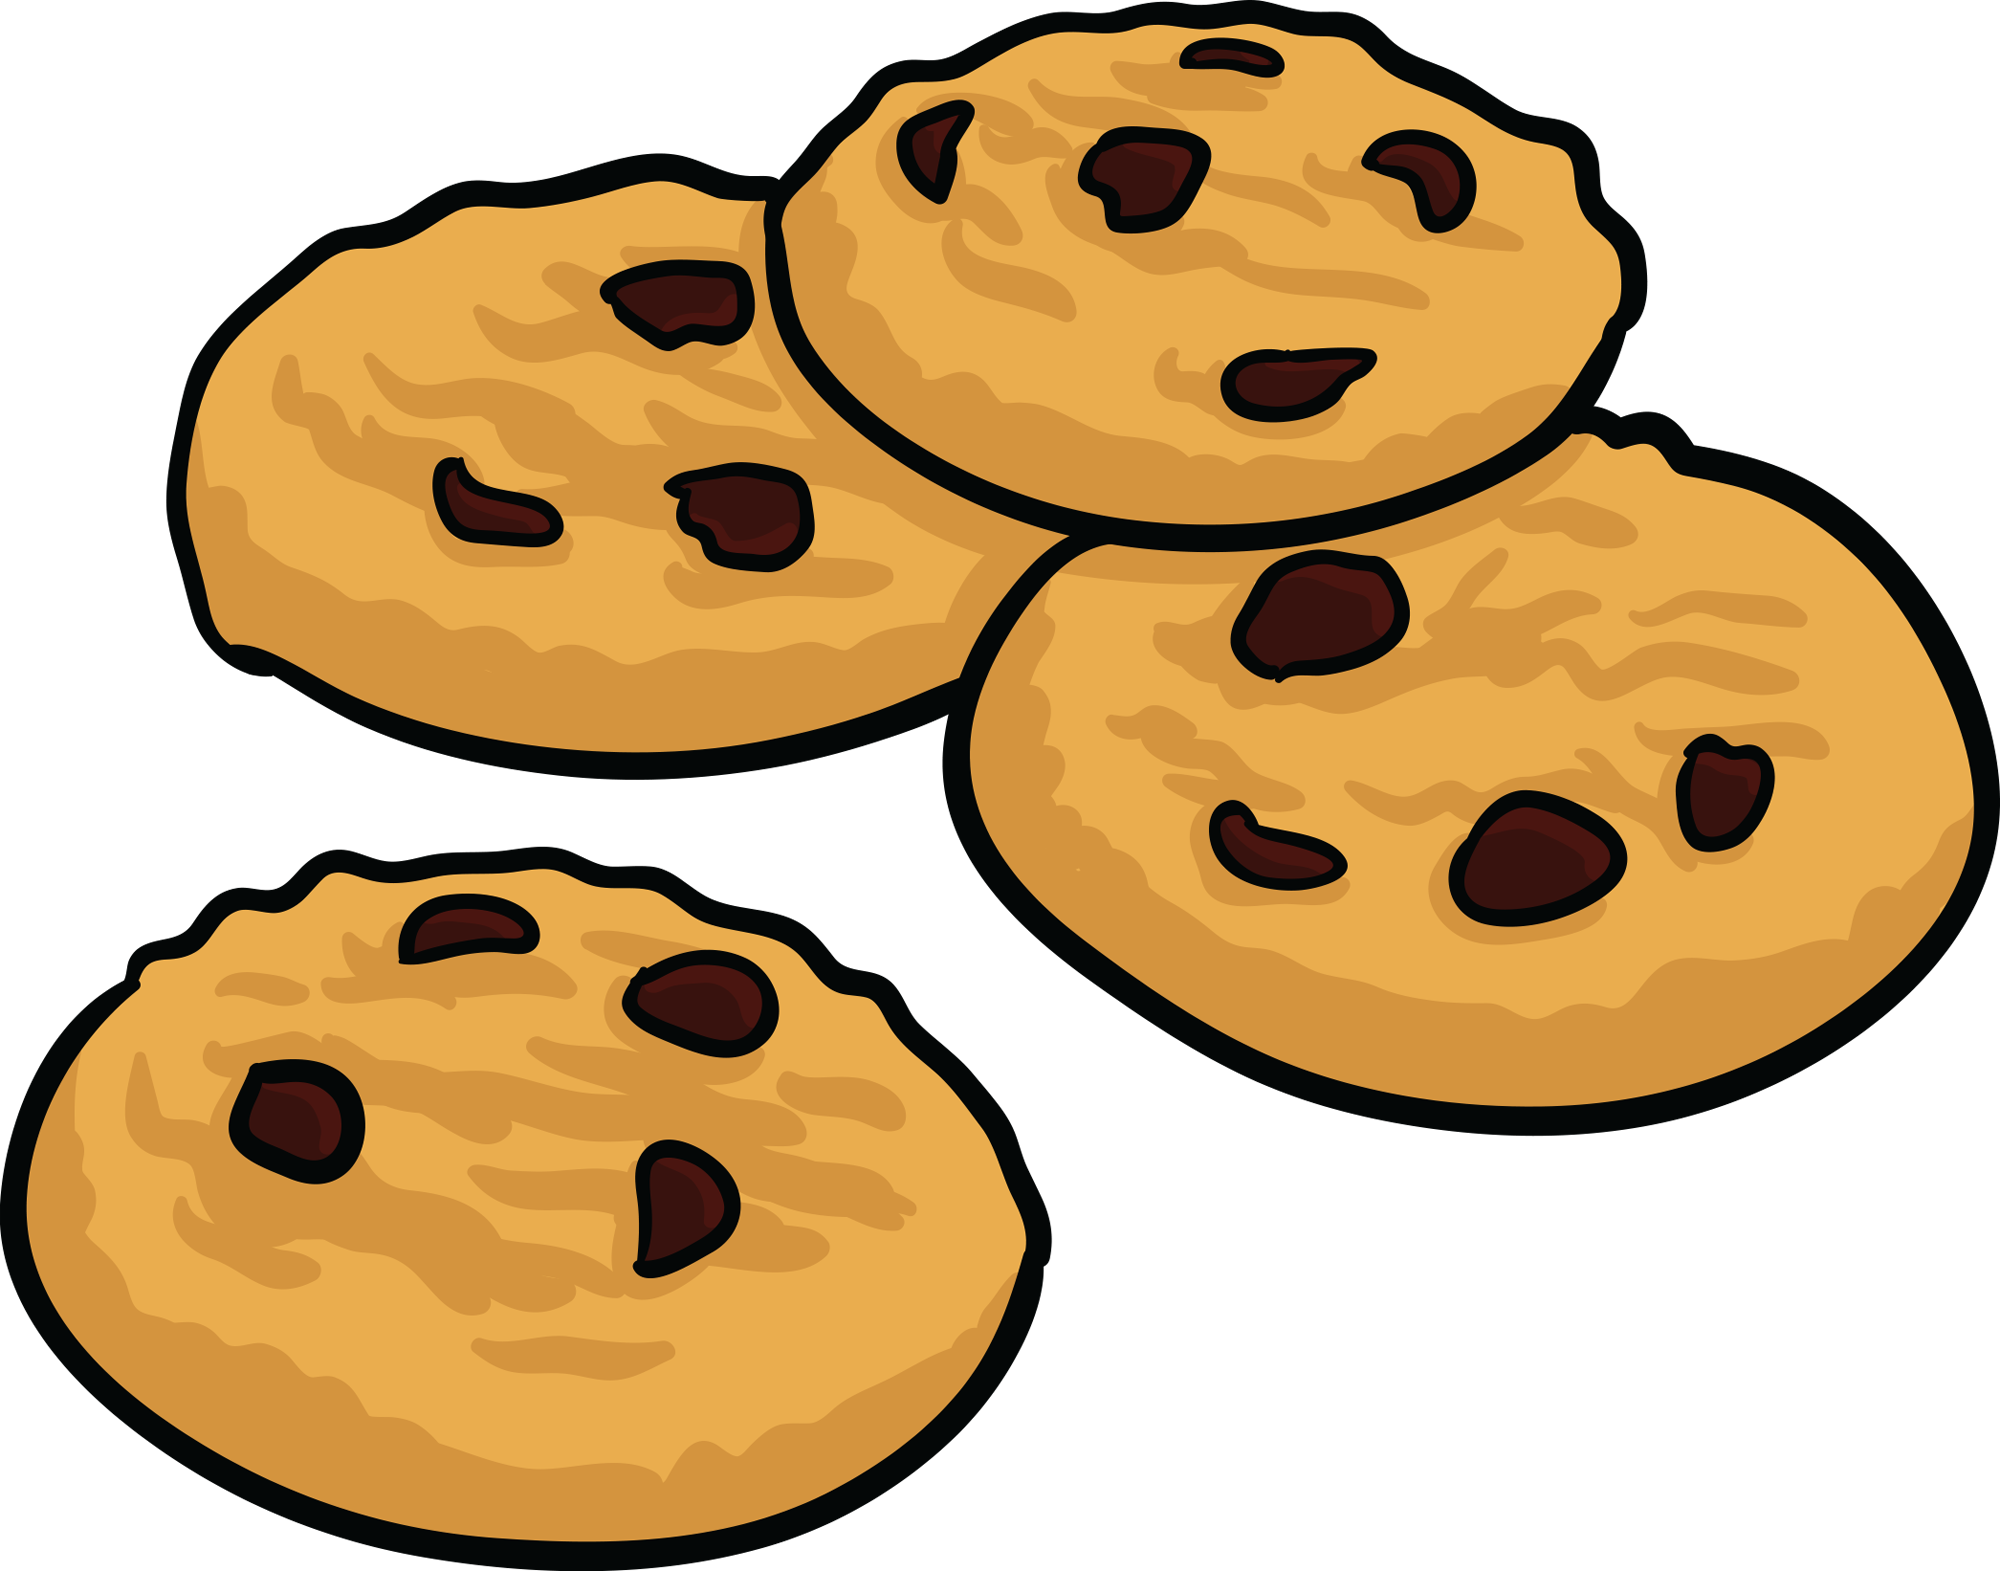 Baking clipart cookie dough Food Confe 014 Gluten Crazy